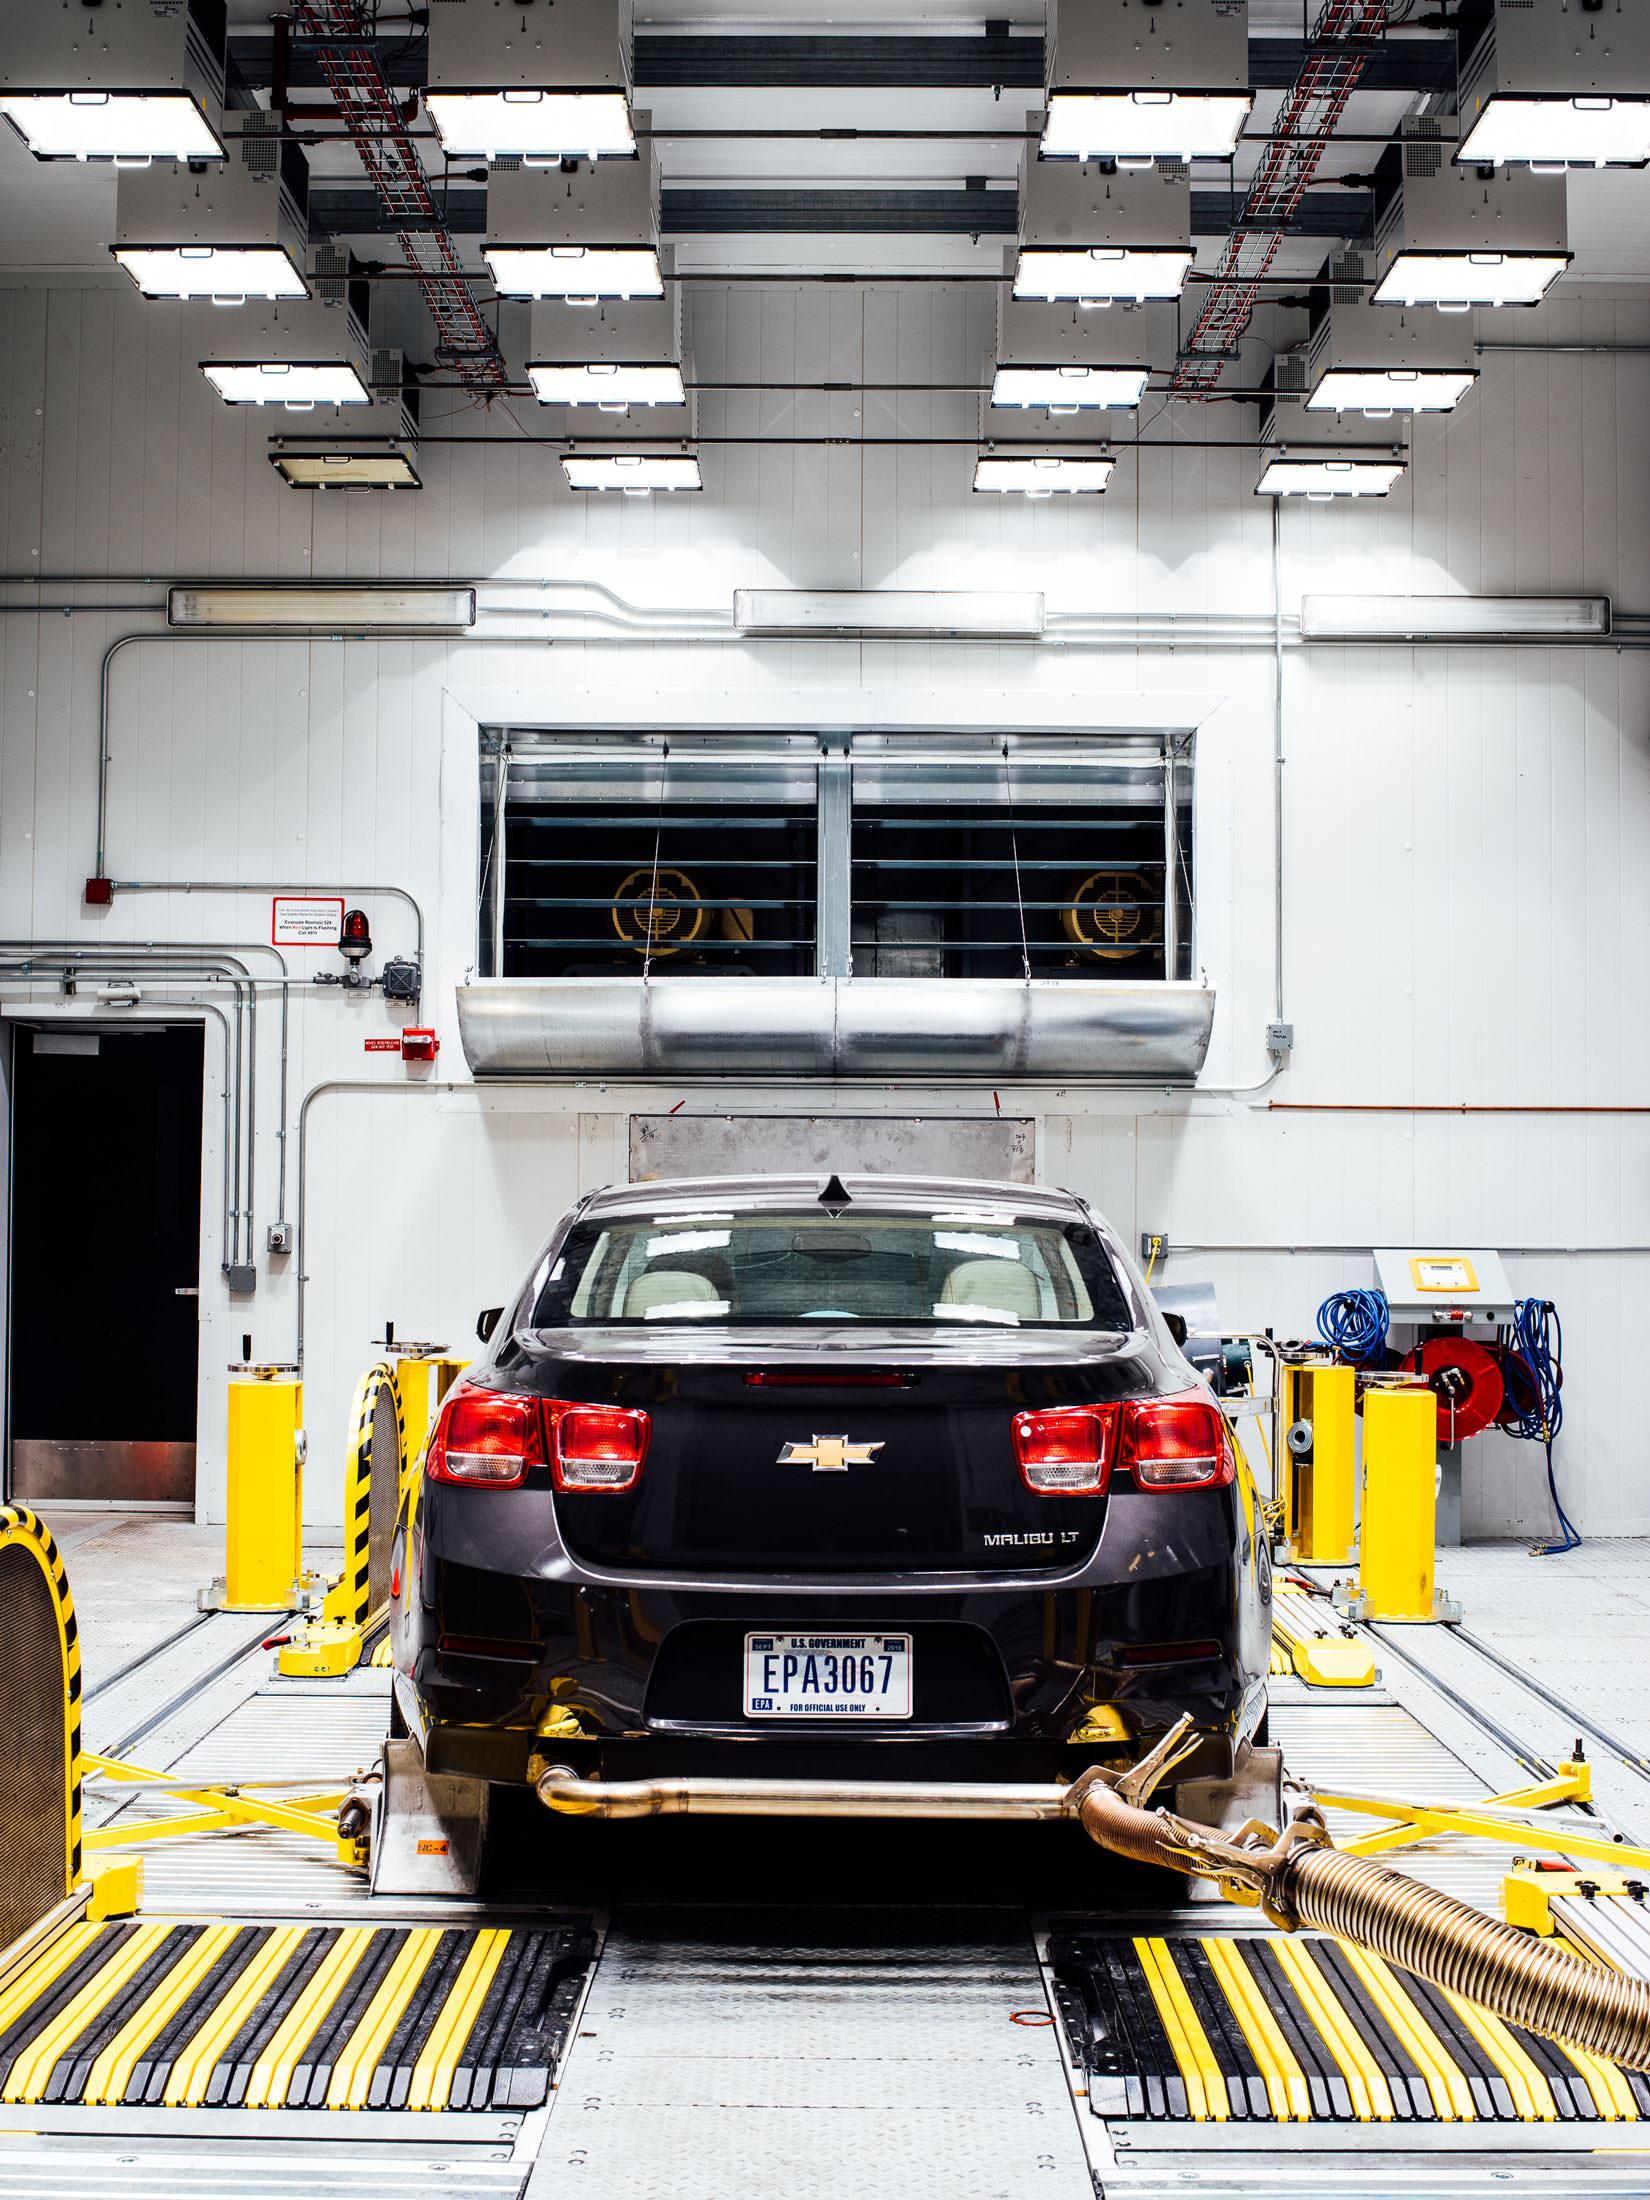 Chris Grundler: The Car-Emissions Sleuth Who's Costing Chrysler $5 Billion